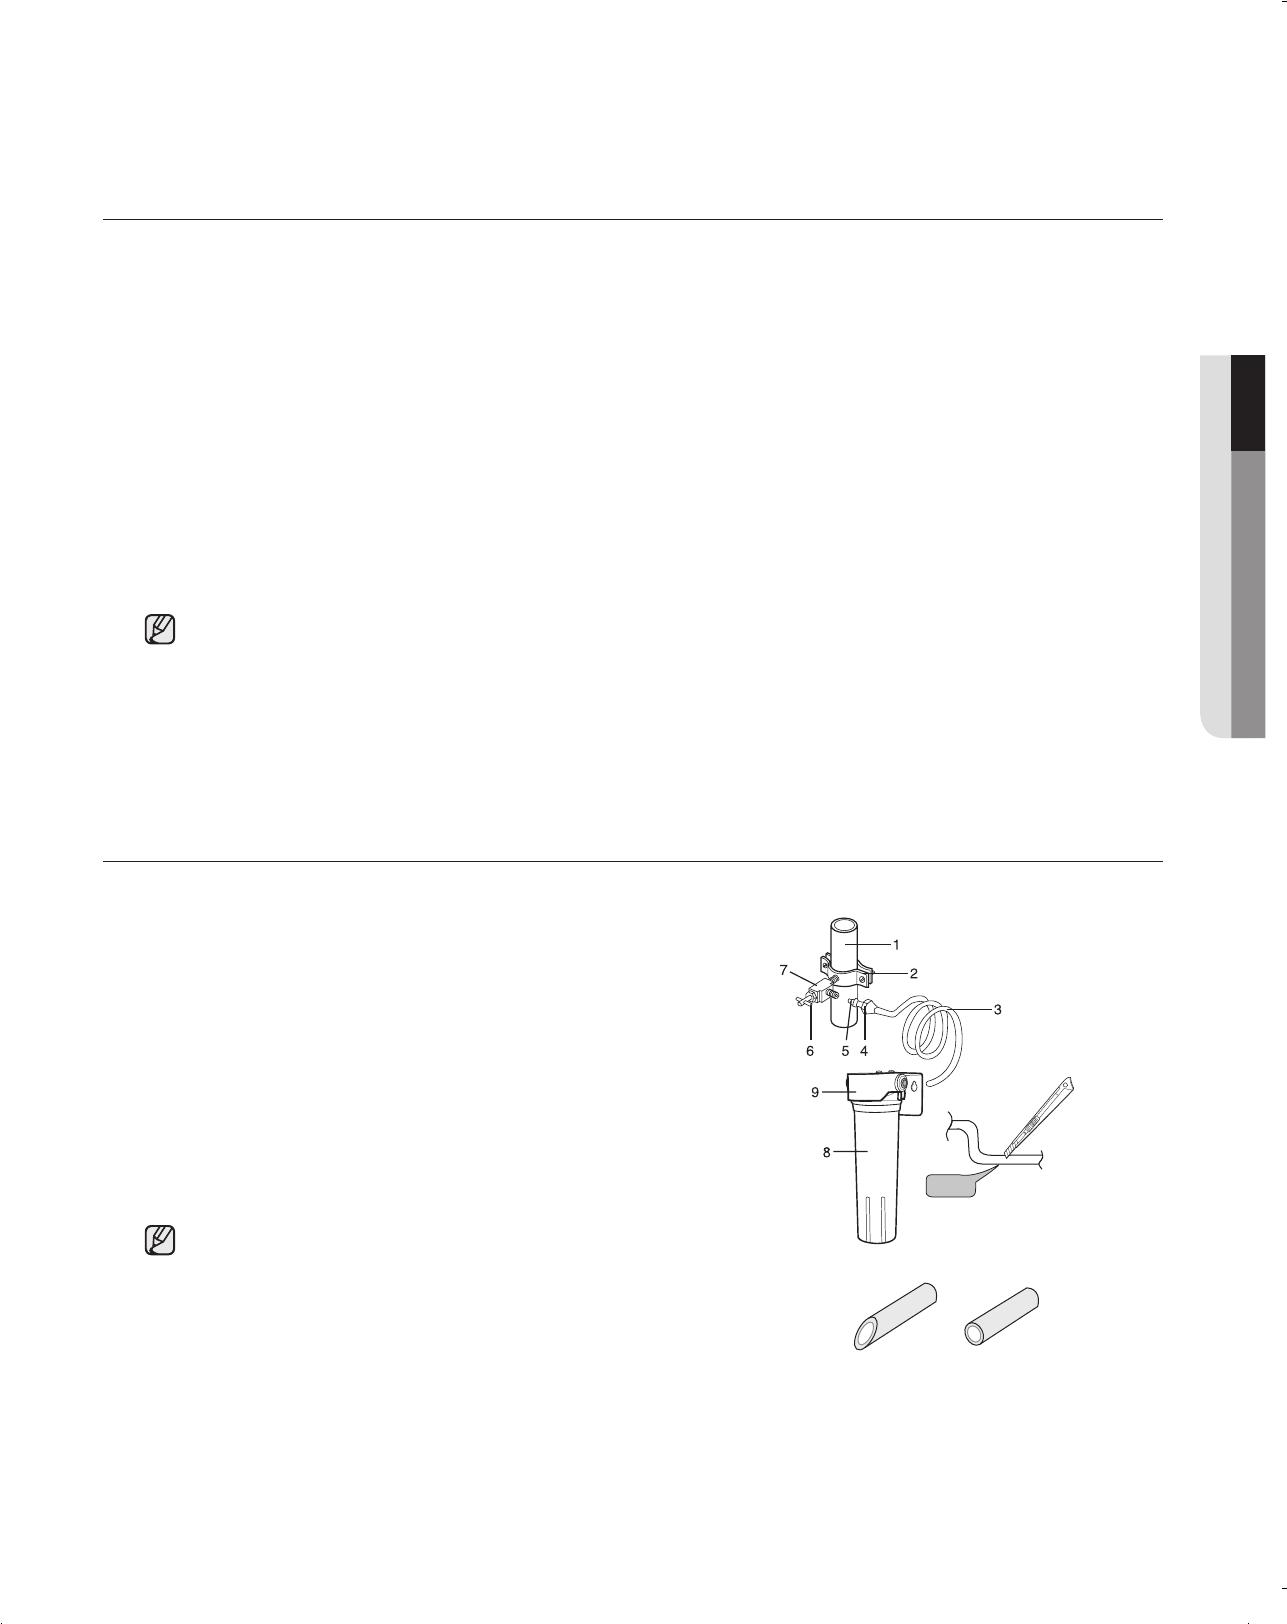 Samsung Rf197acbp Rf197acpn Rf197acrs Rf197acwp Rf217acbp Refrigerator Wiring Diagram Before You Install The Water Line